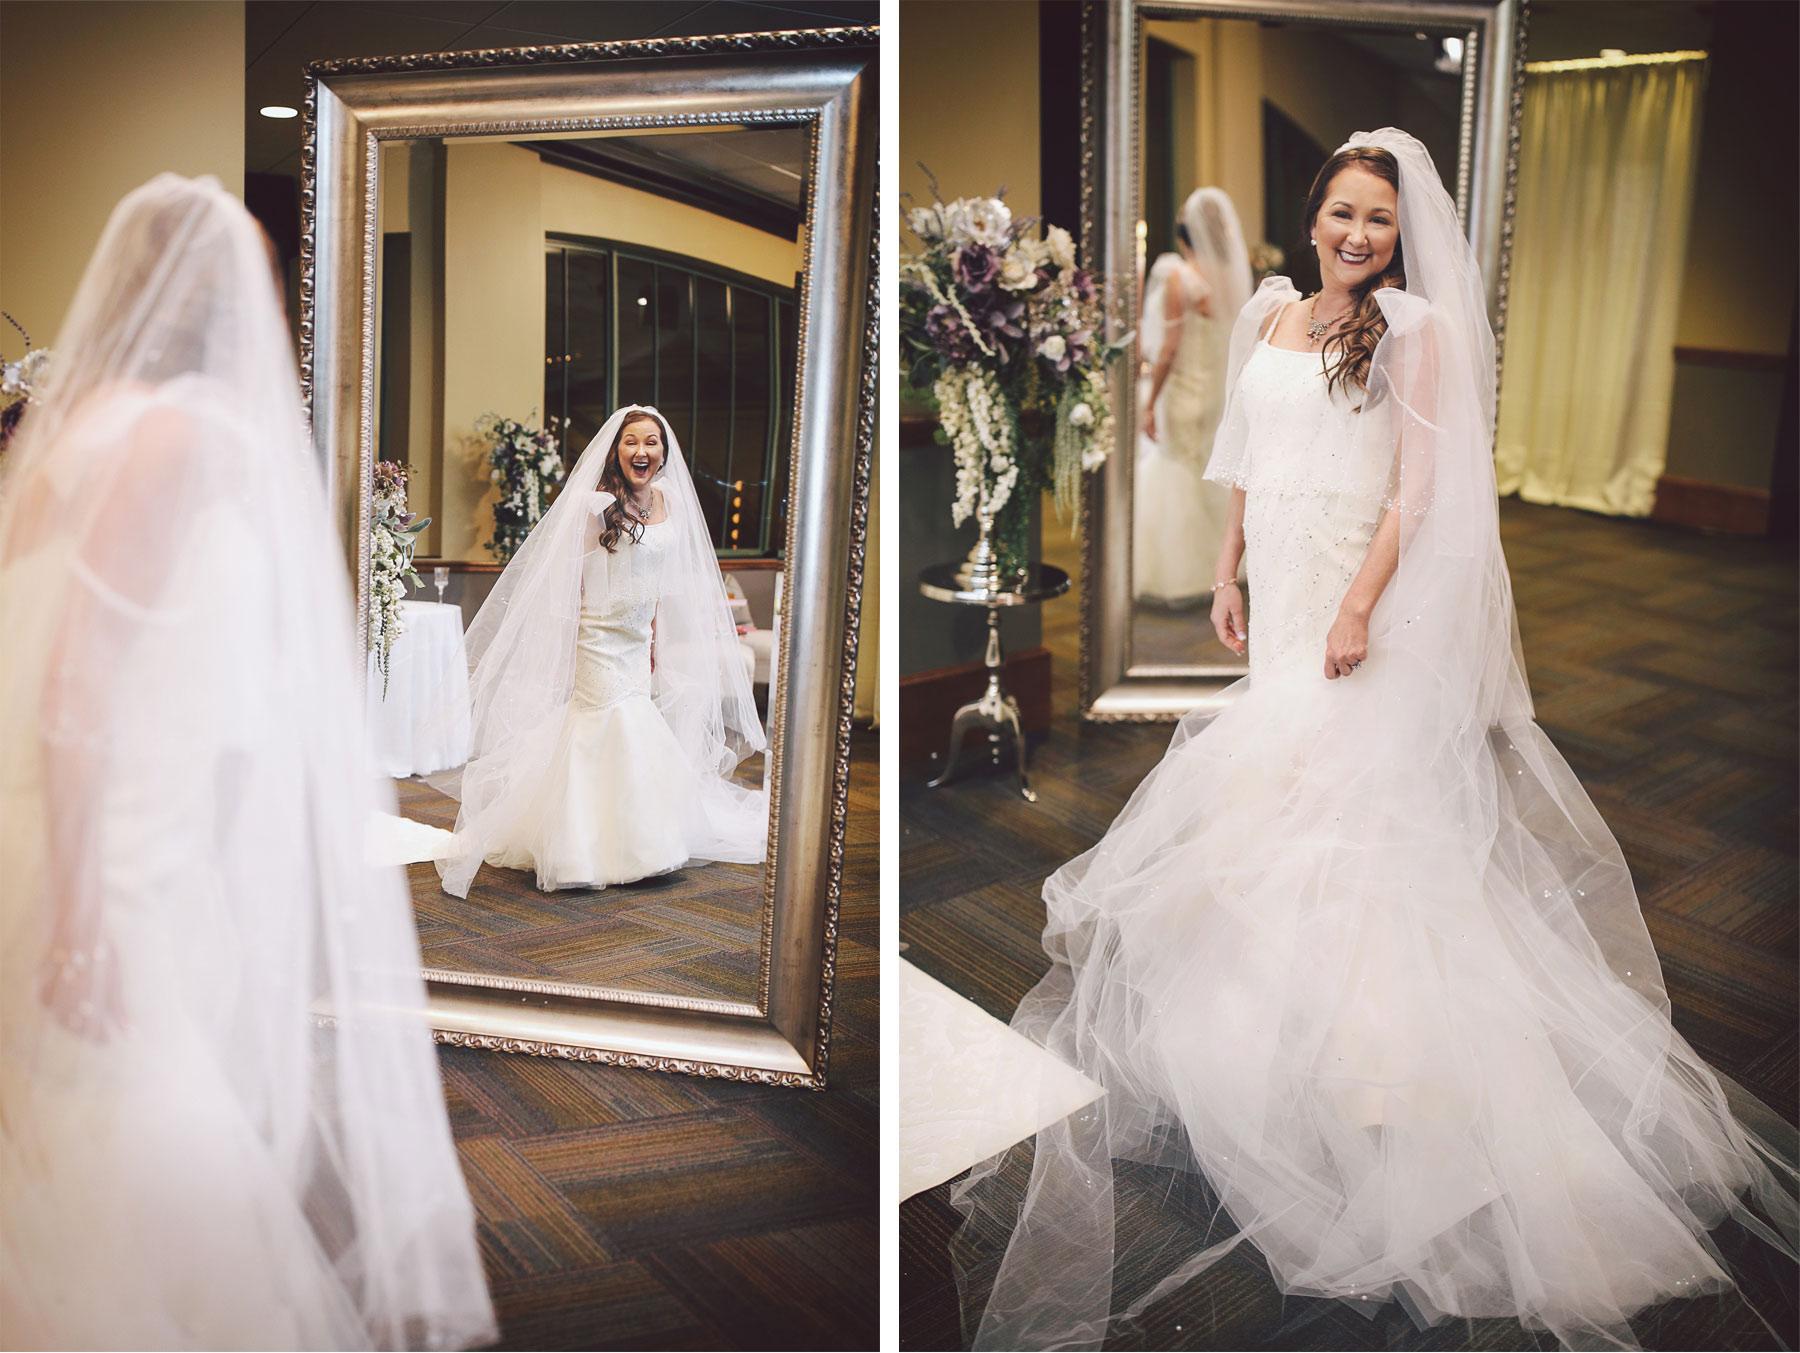 01-Saint-Paul-Minnesota-Wedding-by-Vick-Photography-Union-Depot-Lifetime-Network-David-Tutera-My-Great-Big-Live-Wedding-Dress-Bride-Jennifer-and-Rob.jpg